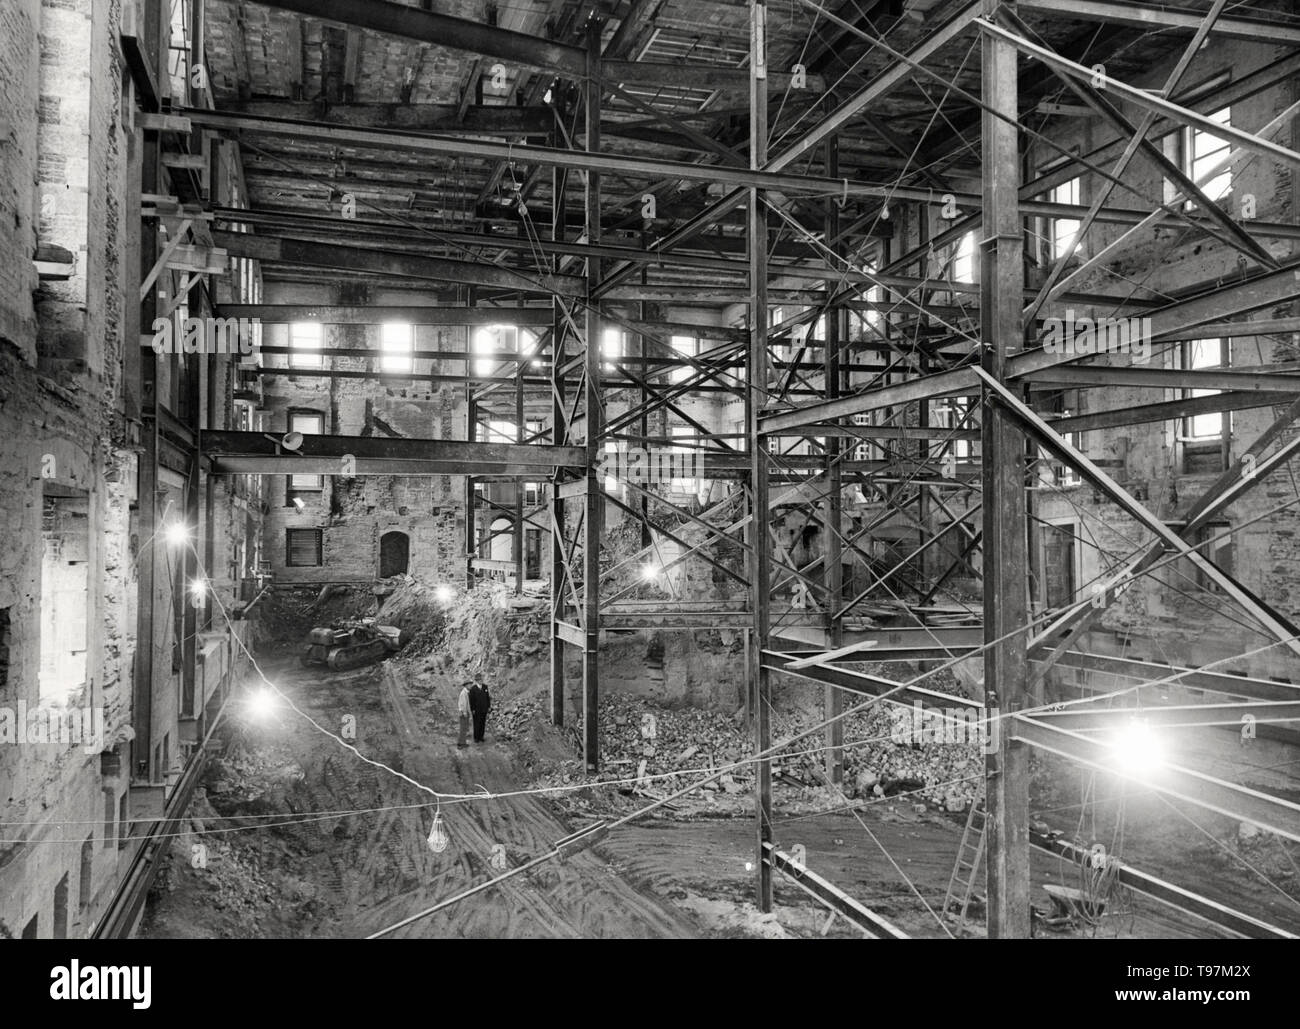 Renovation Work on the White House, circa 1950 - Stock Image